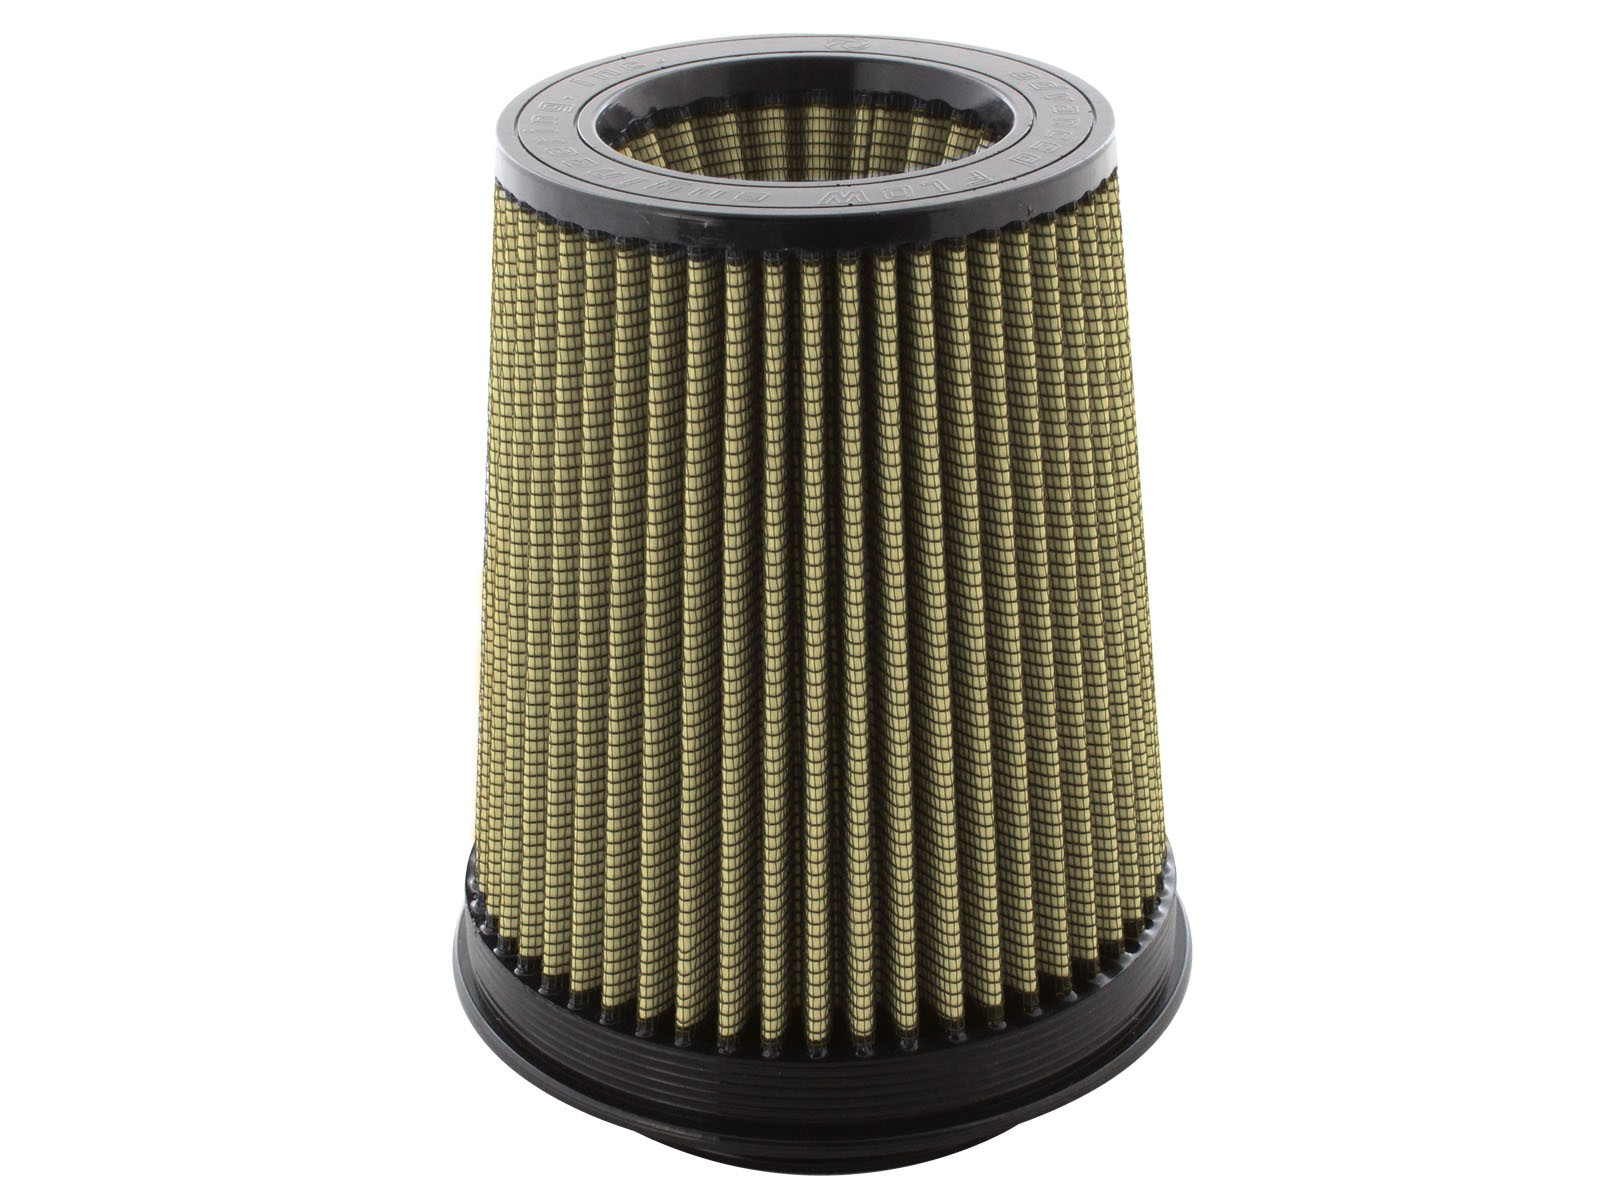 aFe POWER 72-91062 Magnum FLOW Pro GUARD7 Air Filter